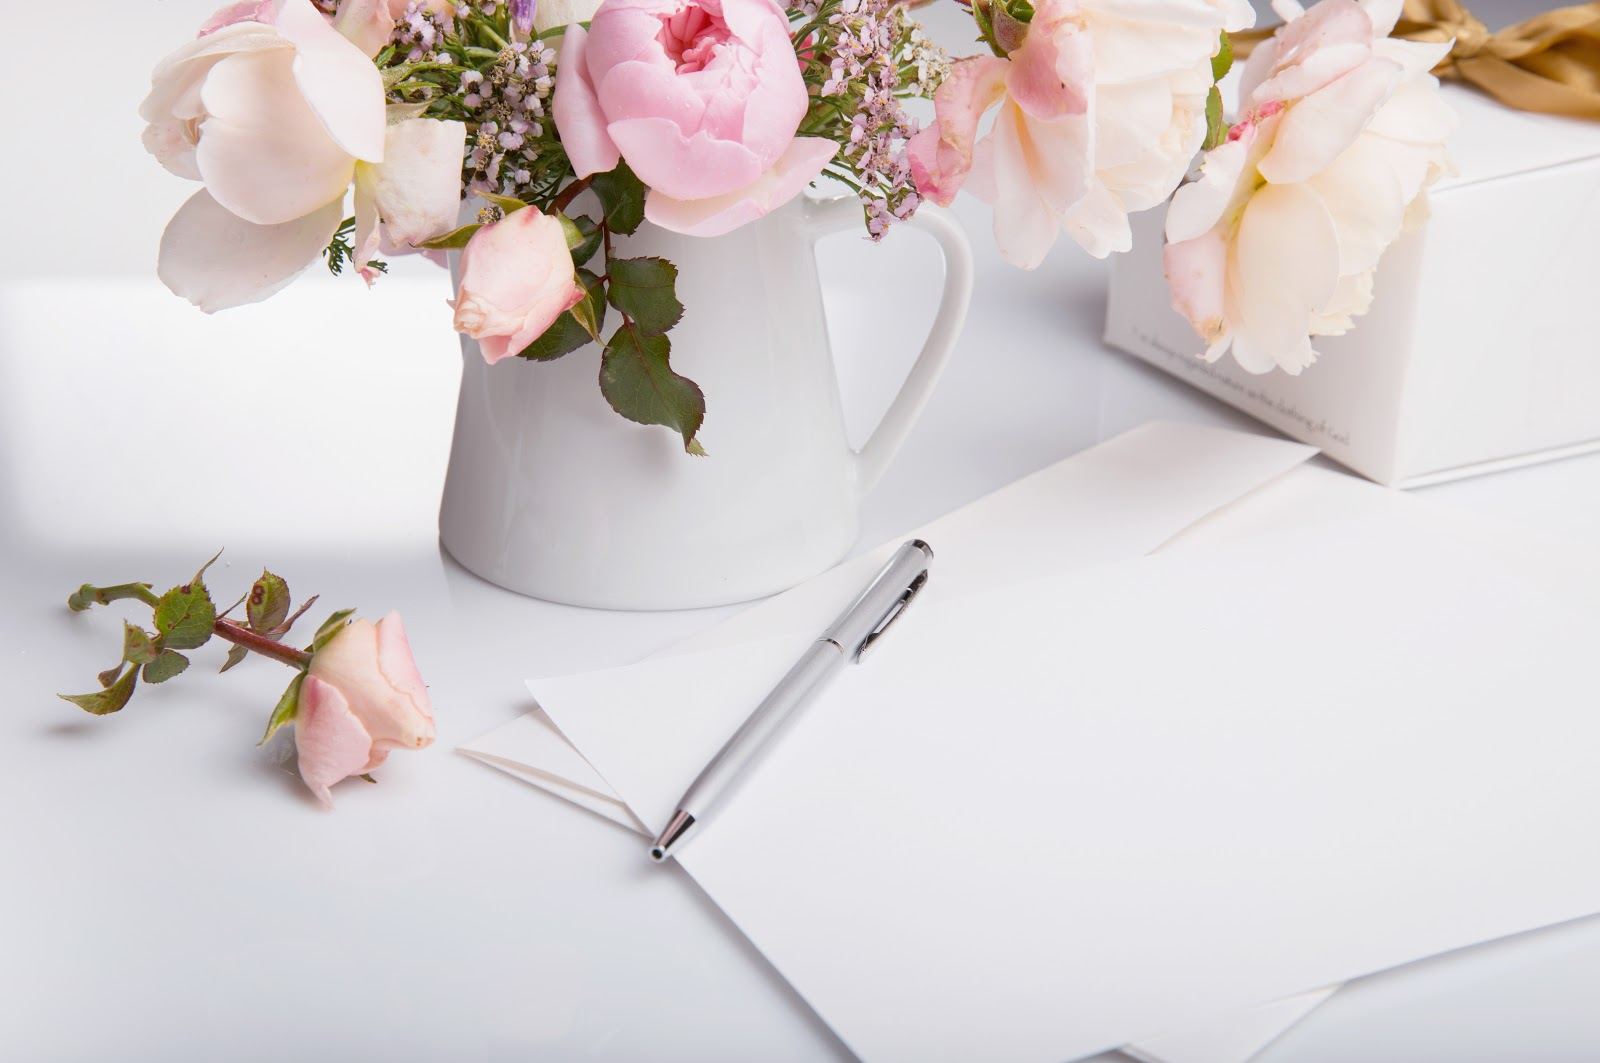 DIY Wedding Invitations: How to Create Beautiful, Custom Designs